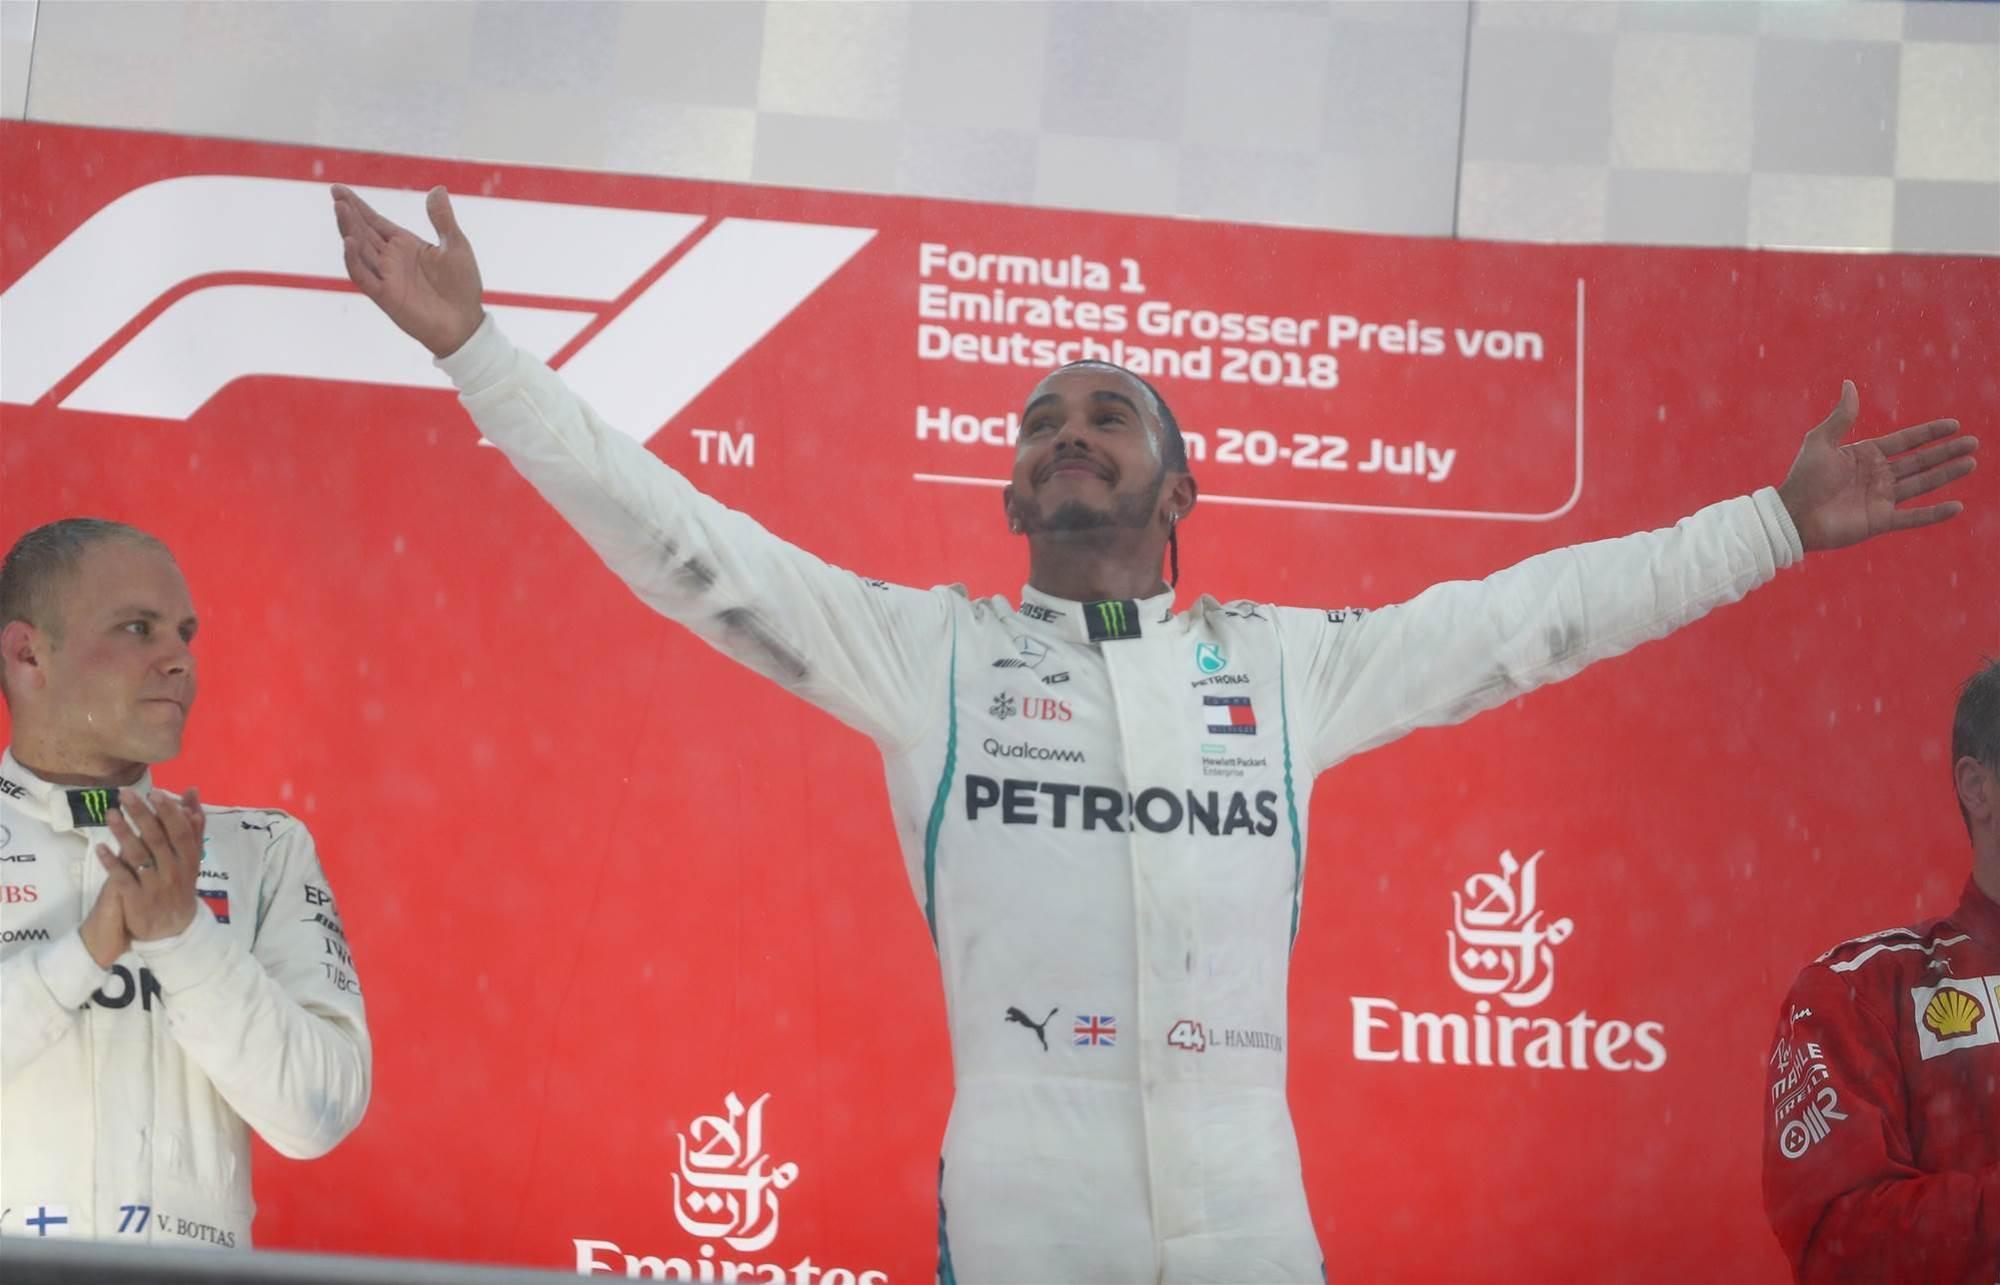 Hamilton strikes as Vettel stumbles in Germany